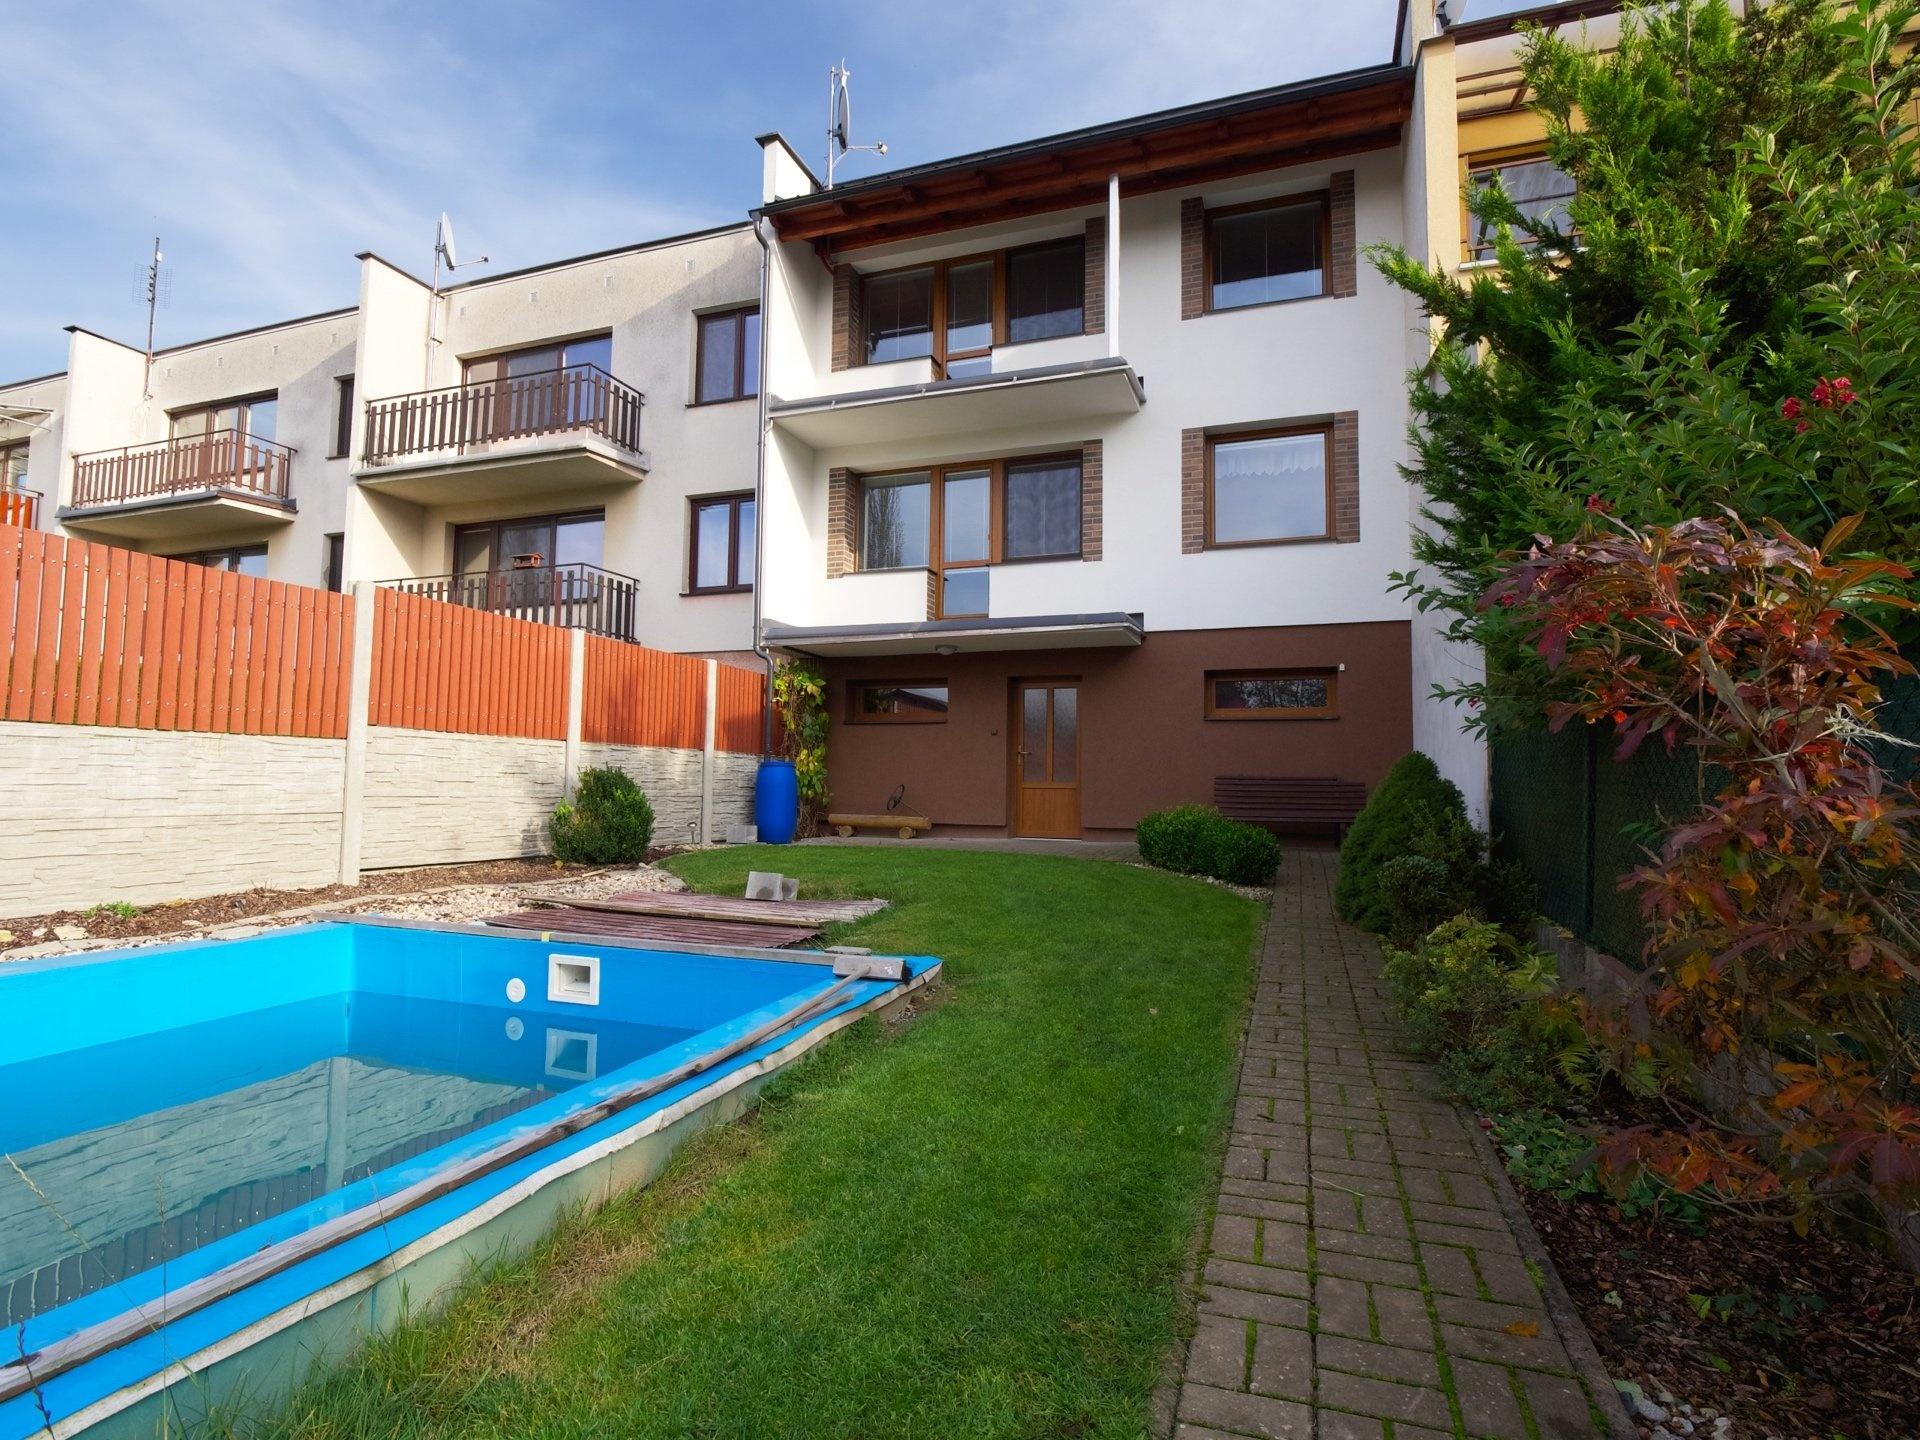 prodej-rodinneho-domu-letohrad-p1210771-6db214